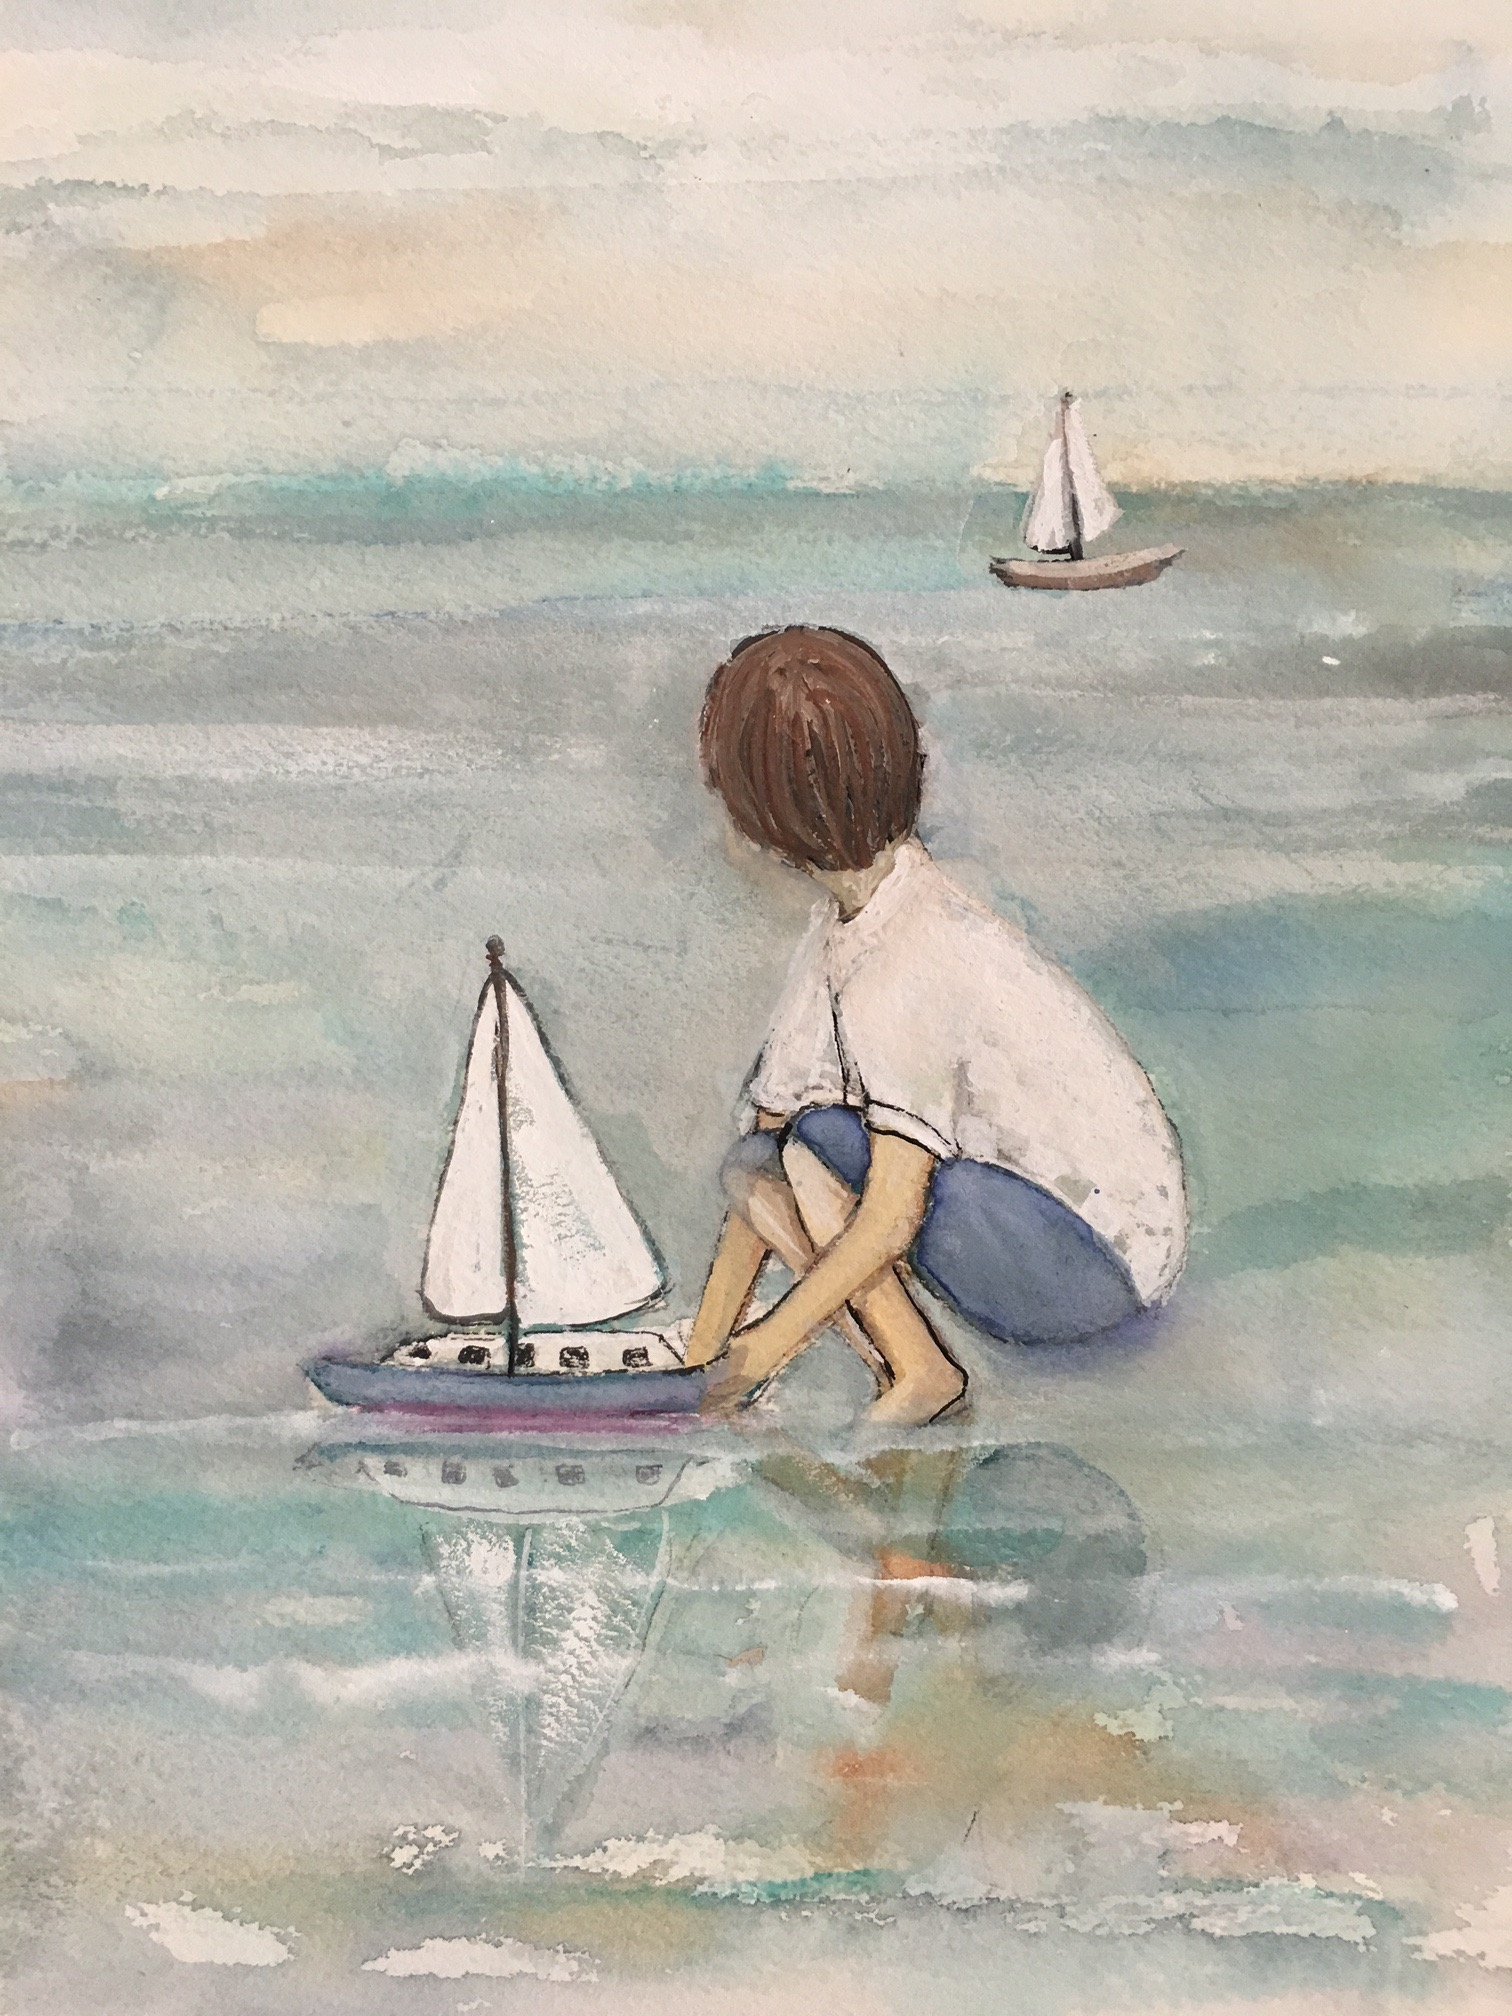 Boating A4 Watercolour.jpg